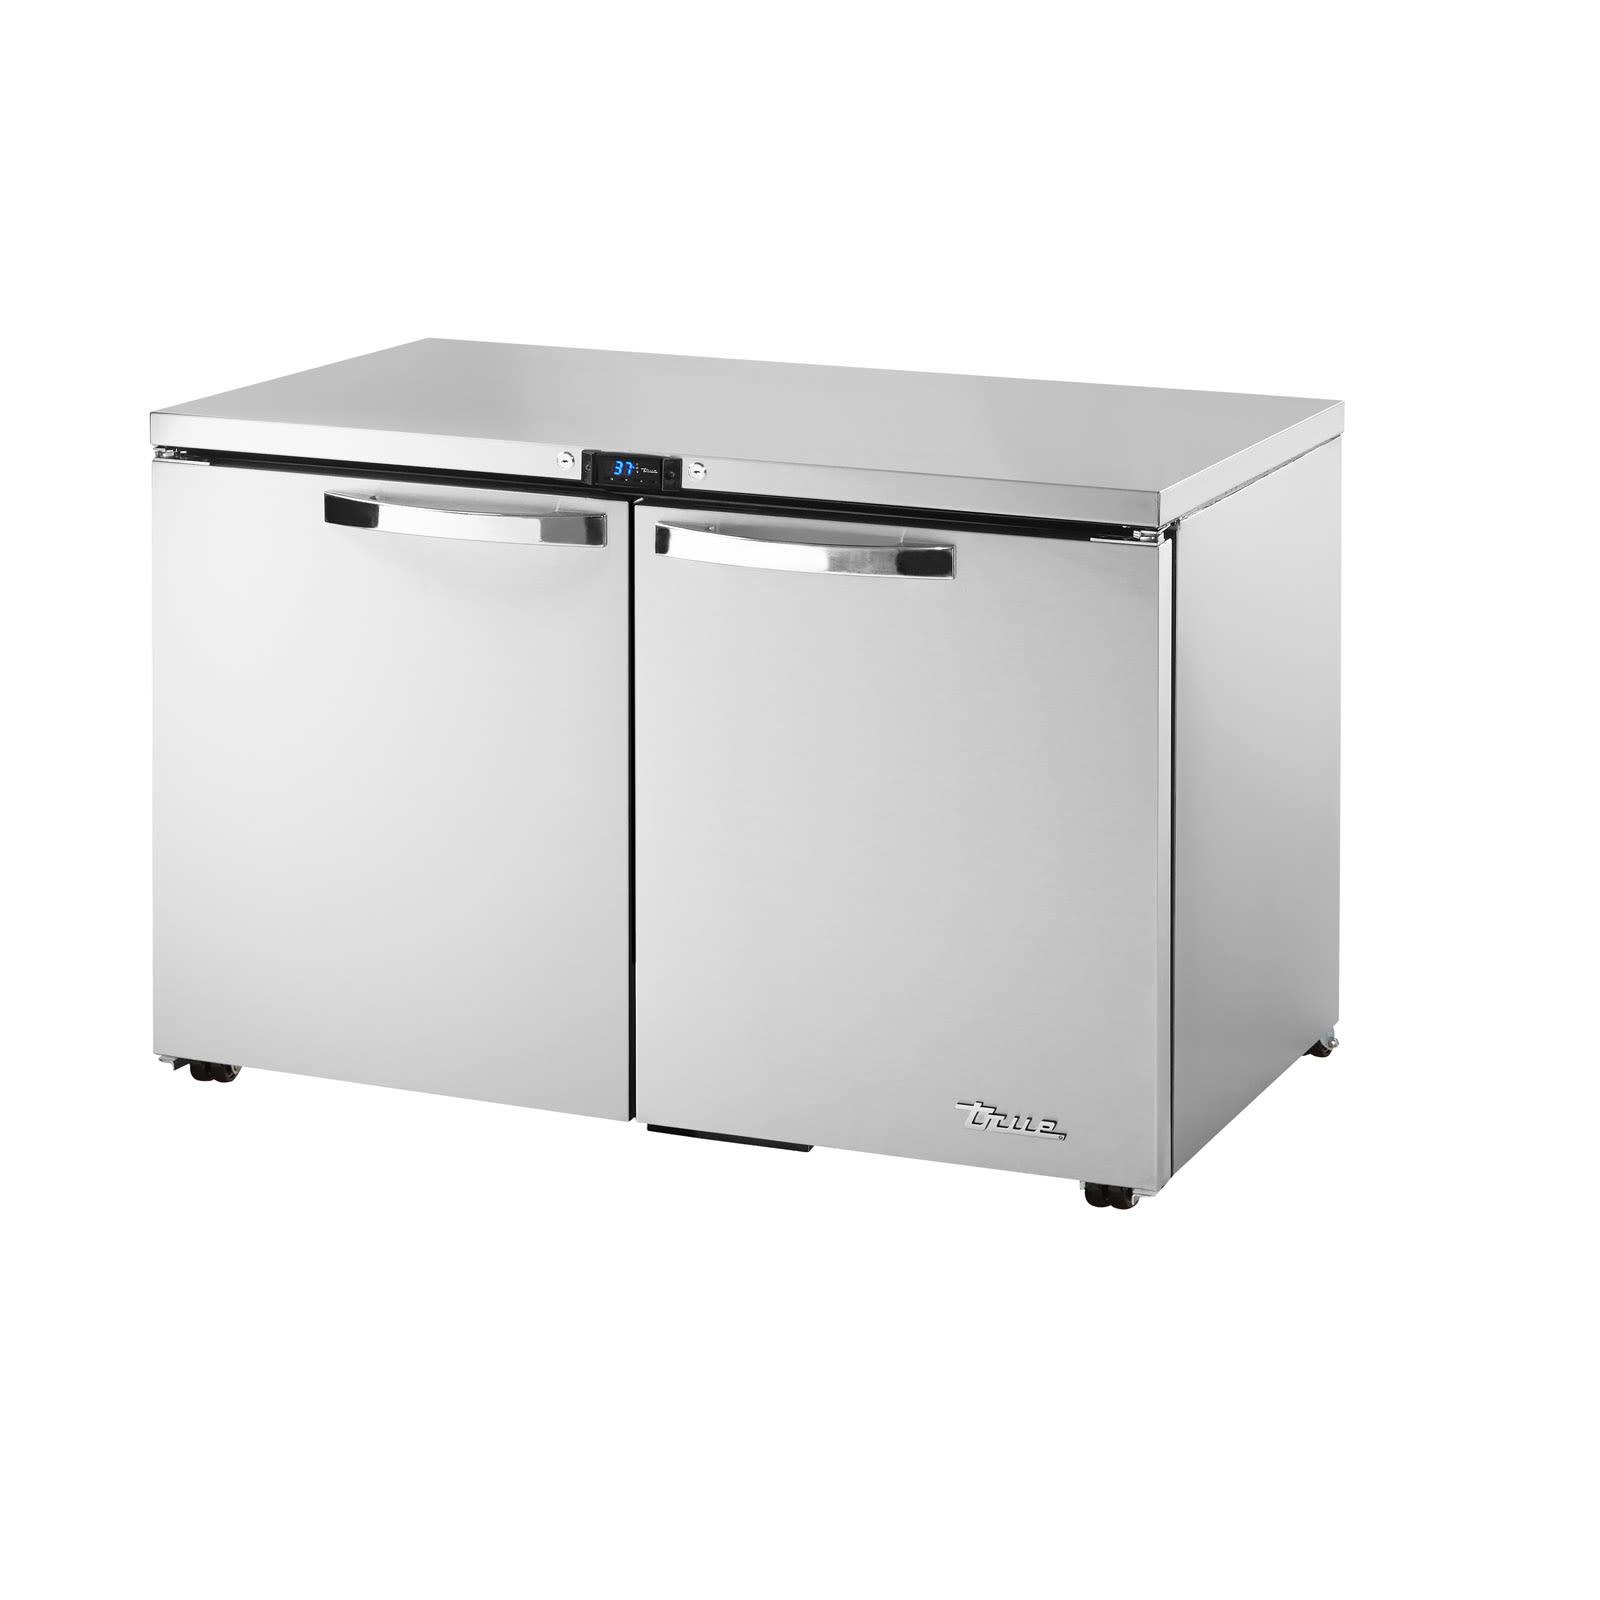 True TUC-48-LP-HC~SPEC1 12-cu ft Undercounter Refrigerator w/ (2) Sections & (2) Doors, 115v